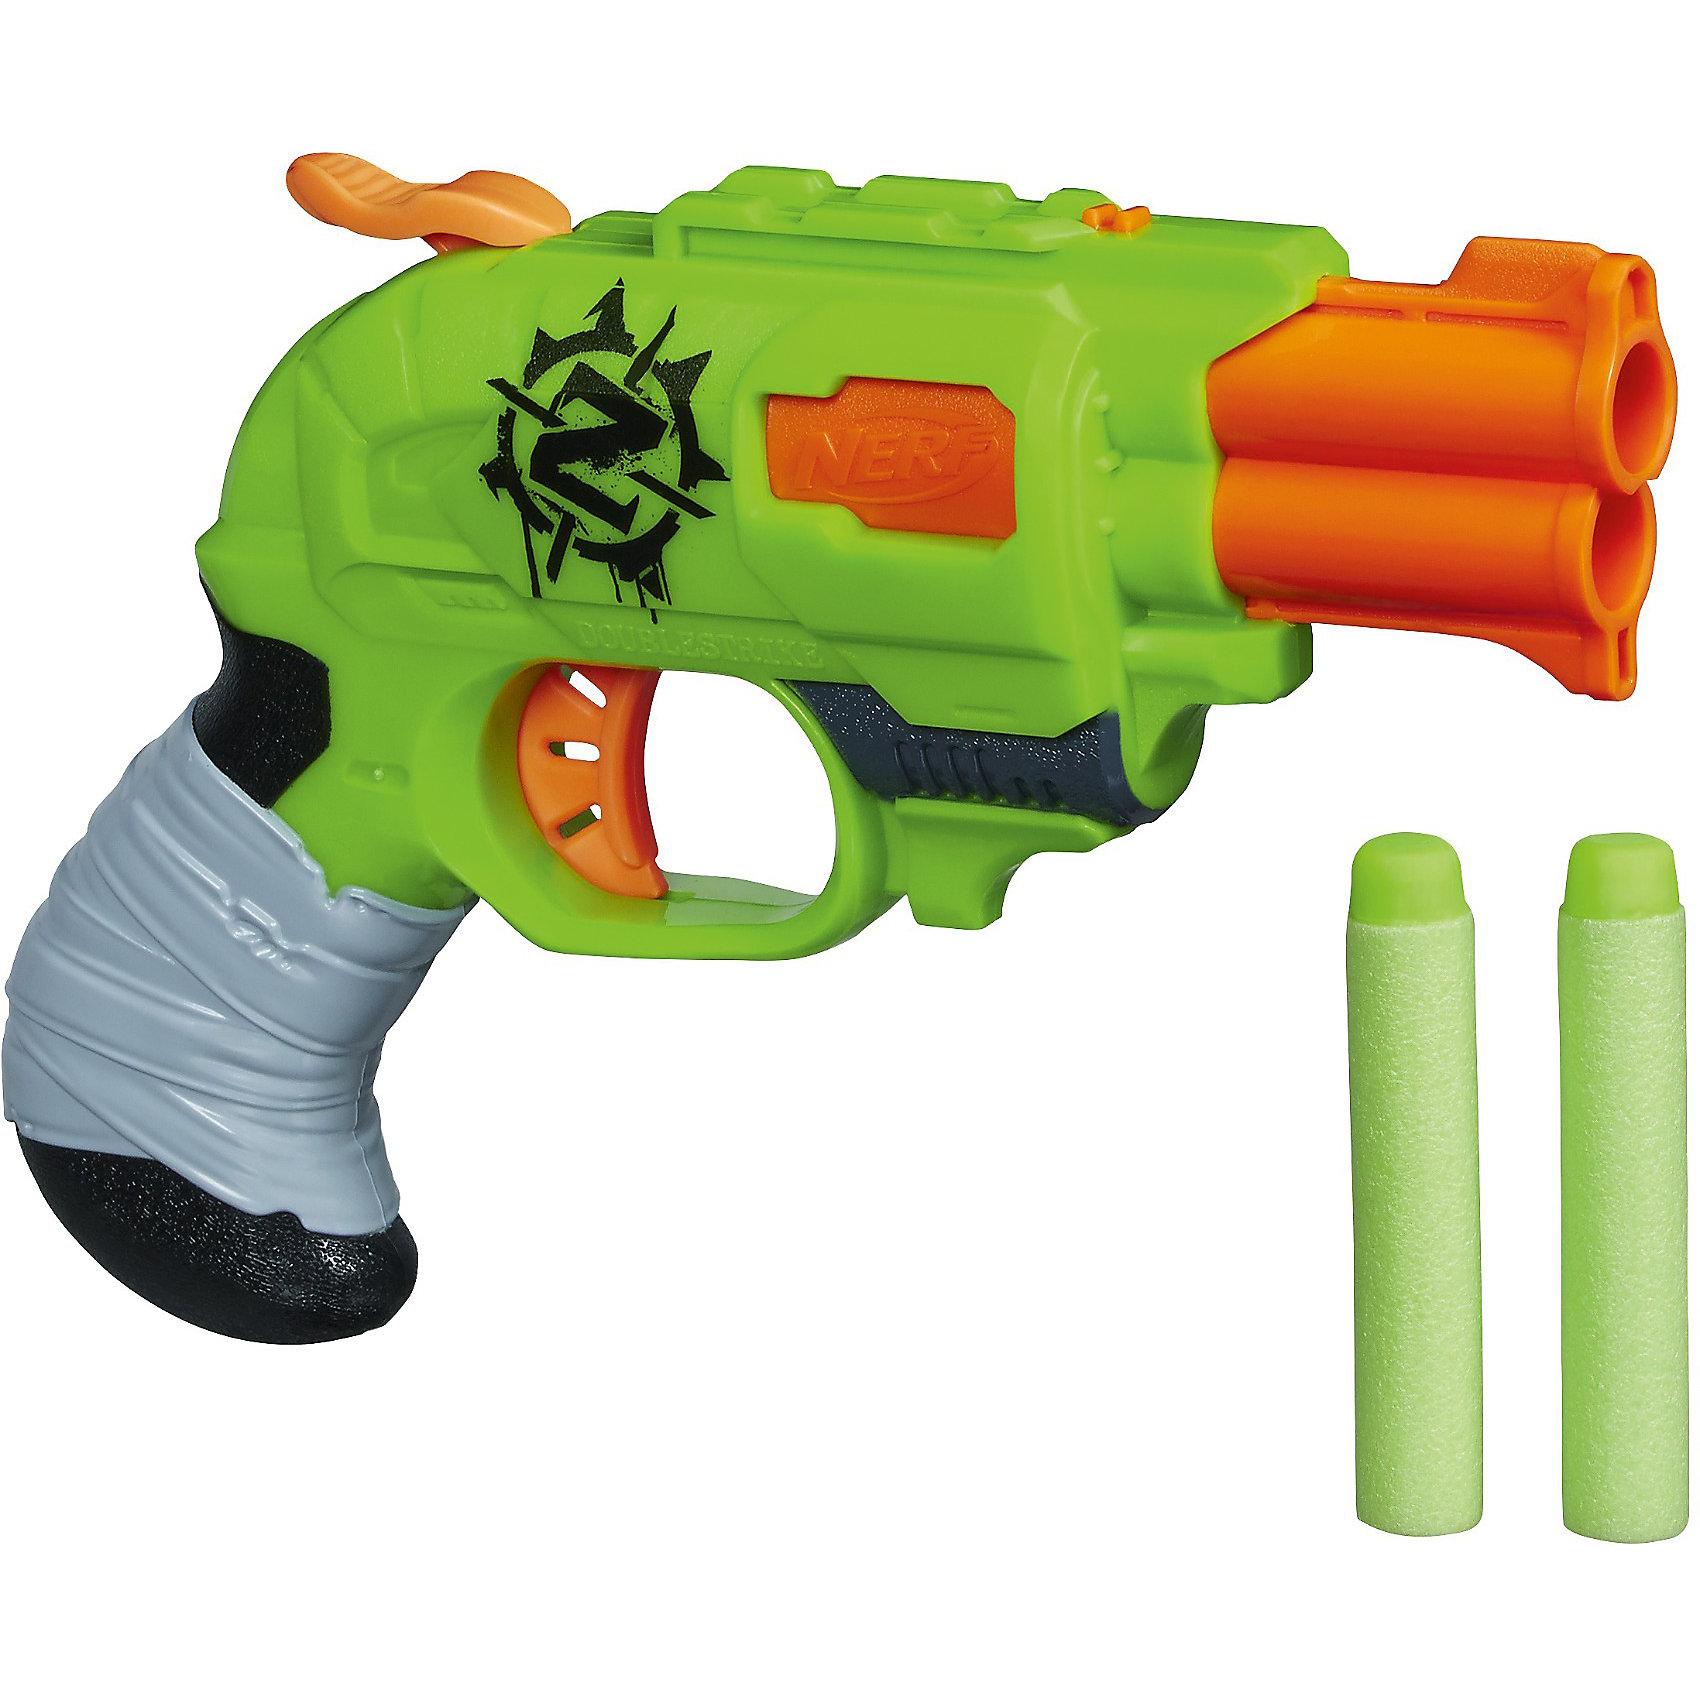 Hasbro Бластер Зомби Страйк Двойная Атака, NERF игрушка hasbro nerf бластер зомби страйк сайдстрайк a6557